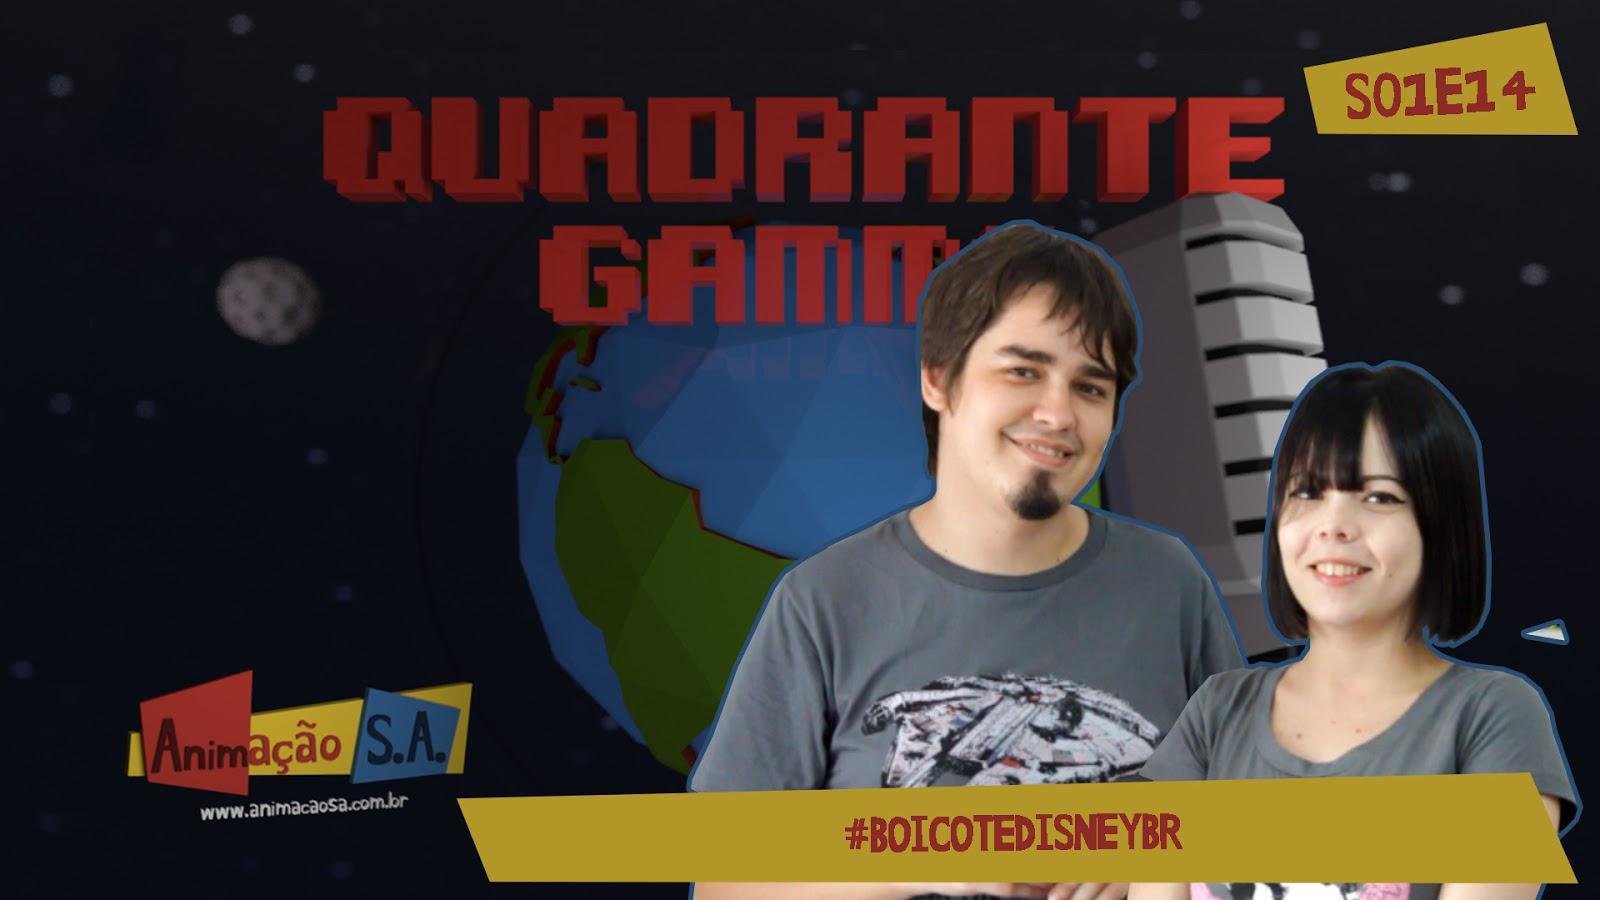 Quadrante Gamma S01E14 - #BoicoteDisneyBR